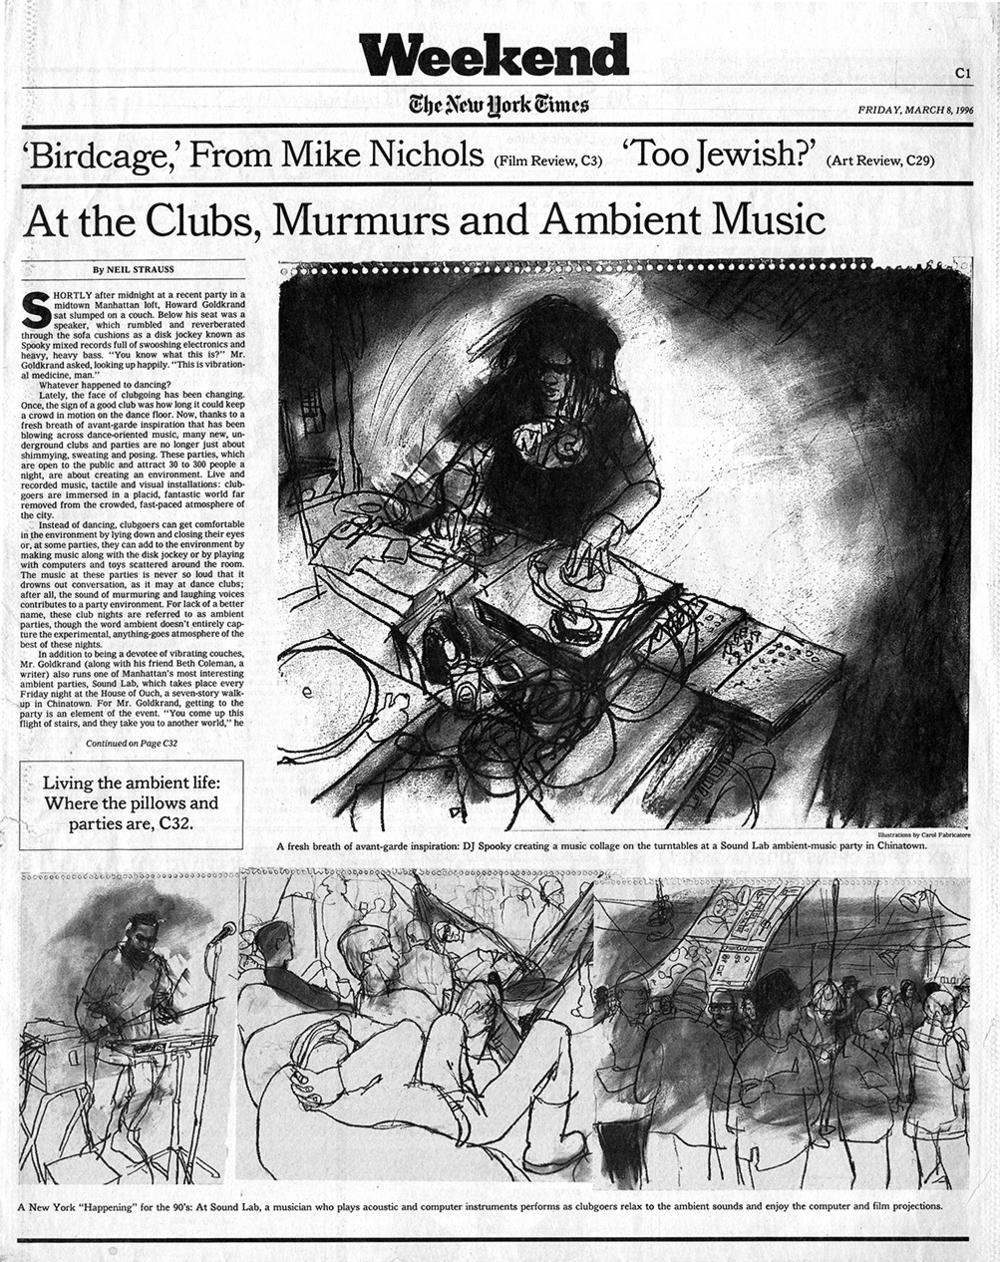 NYT ambient music1.jpg